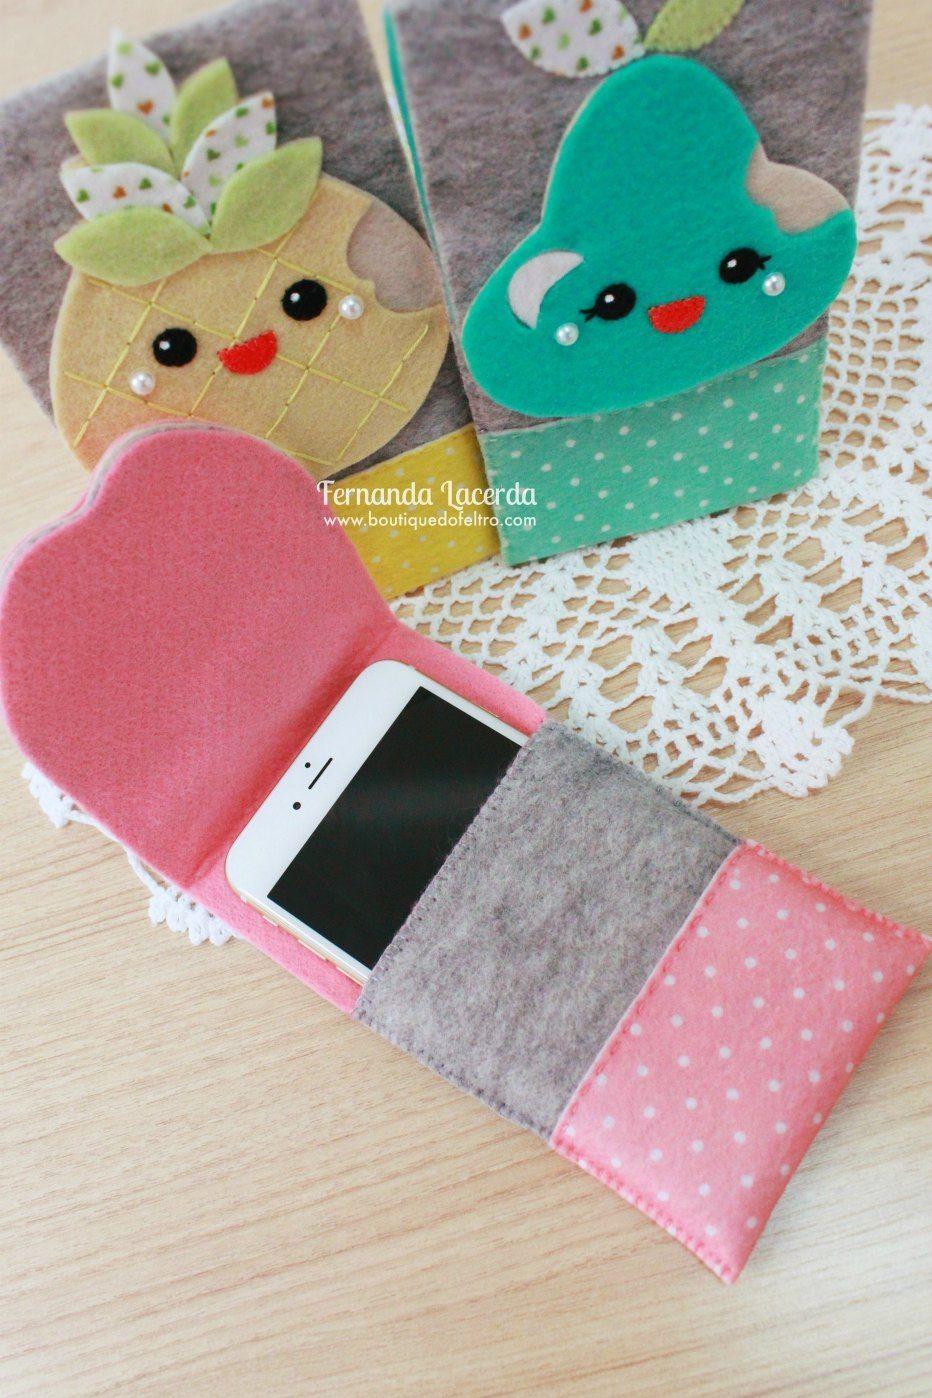 Moldes de fundas para celular en fieltro. | Felt crafts, Sewing projects,  Felt diy